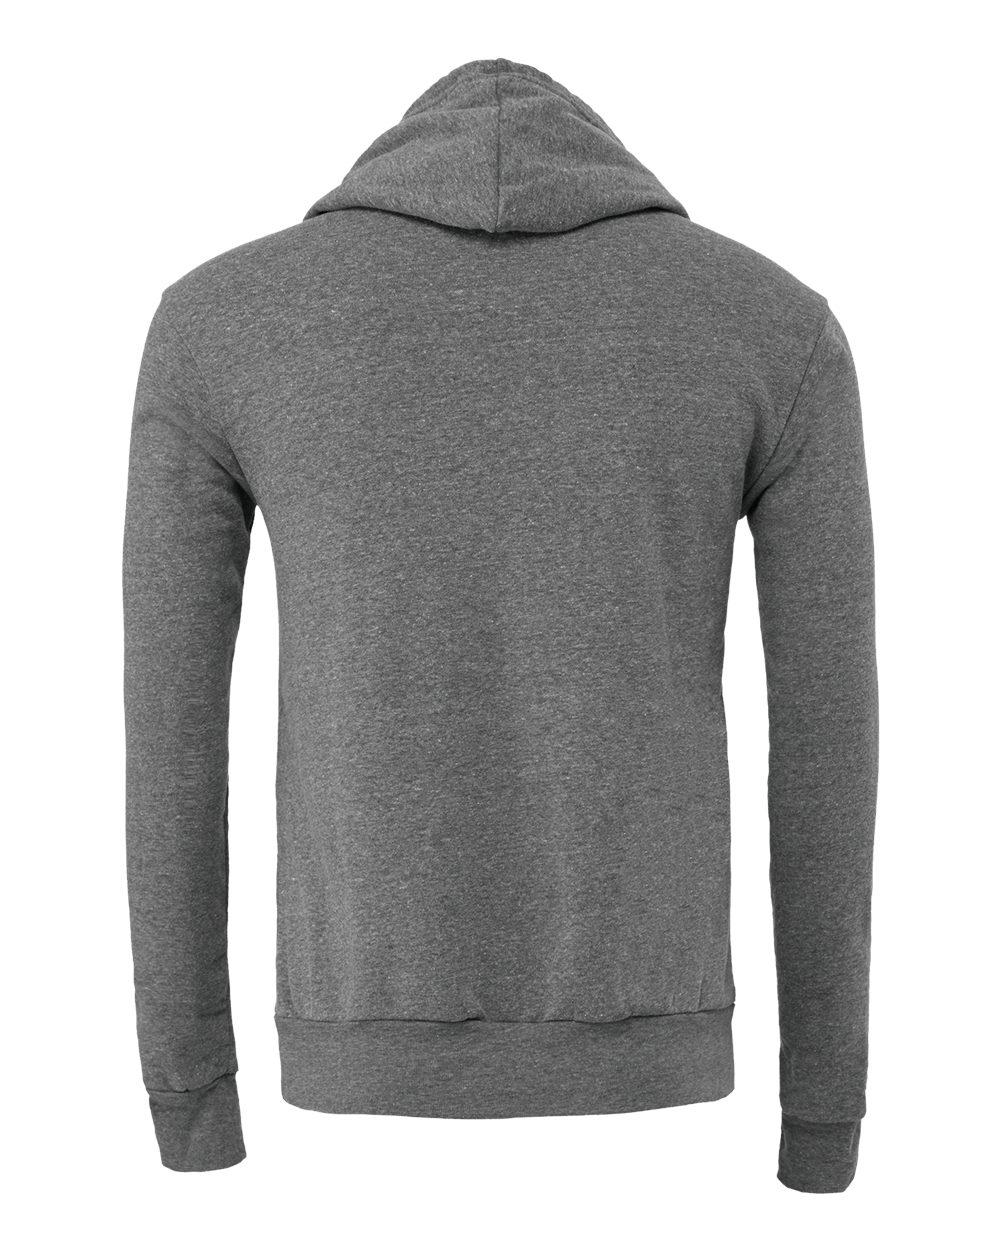 Bella-Canvas-Unisex-Sponge-Hooded-Pullover-Sweatshirt-Blank-3719-up-to-2XL thumbnail 26